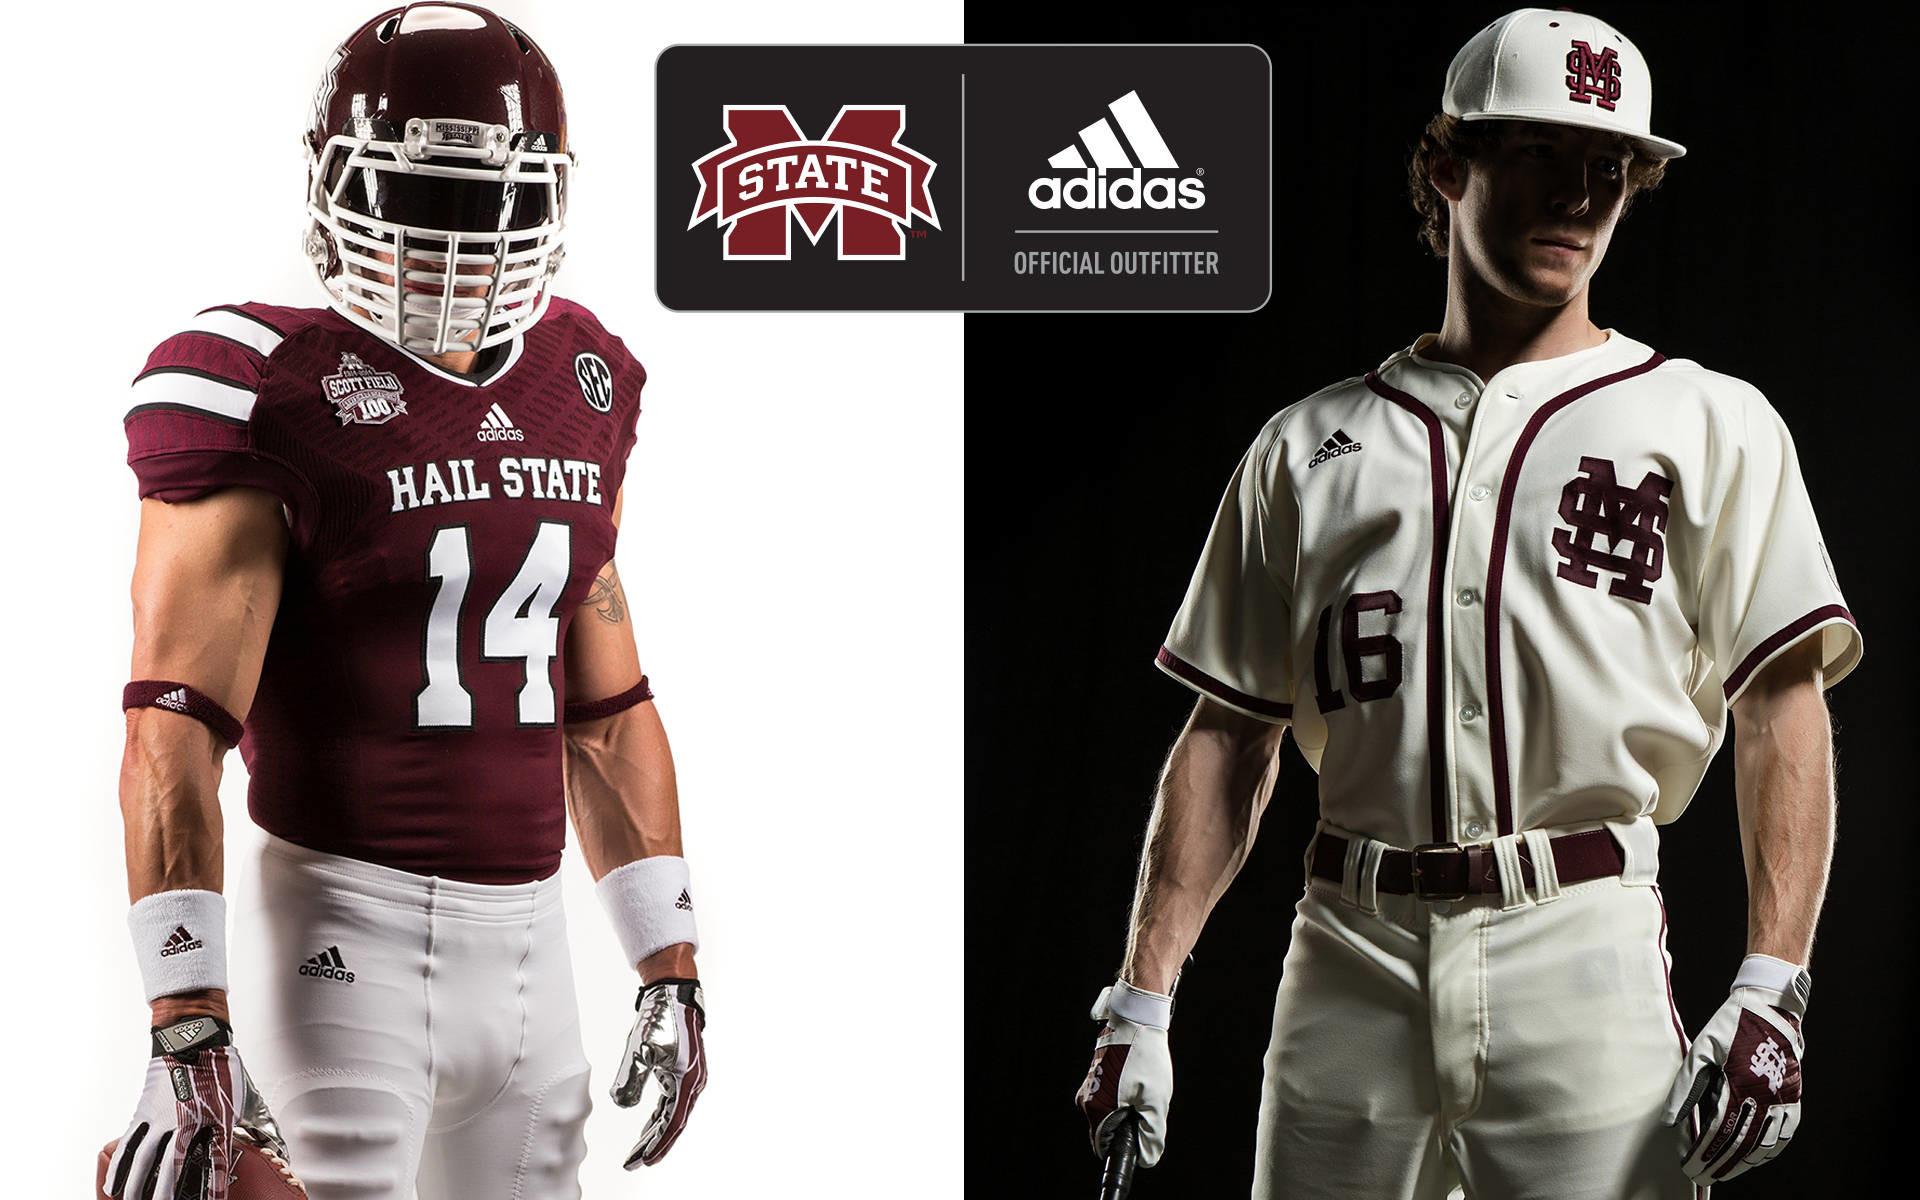 MSU Extends Adidas Contract, Unveils Uniforms